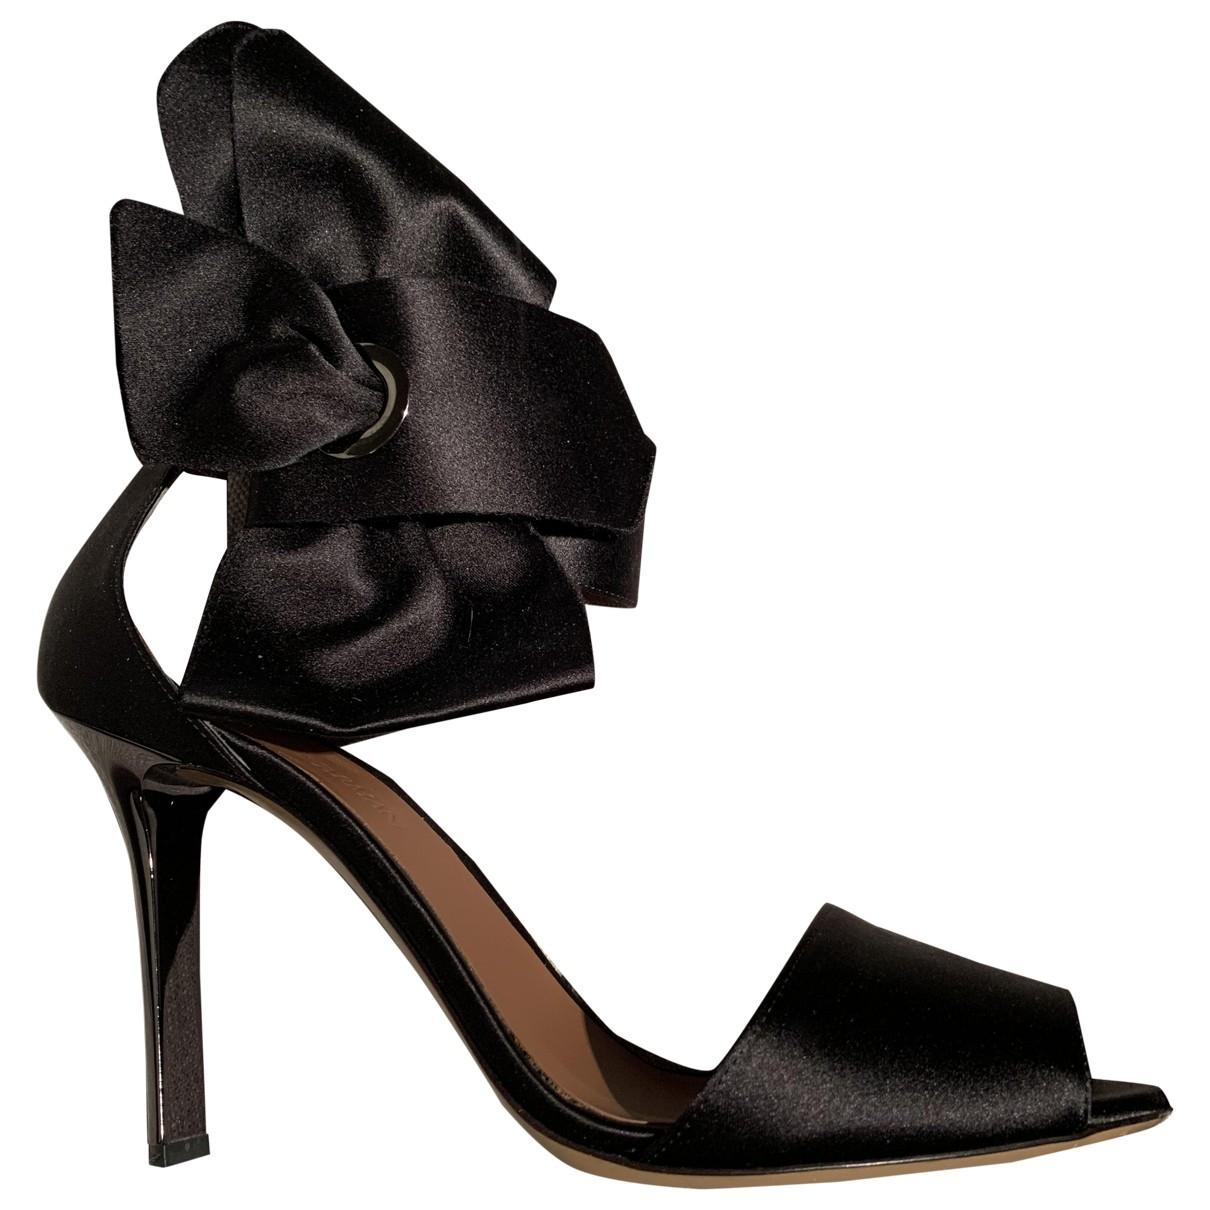 Emporio Armani \N Black Cloth Sandals for Women 38 EU